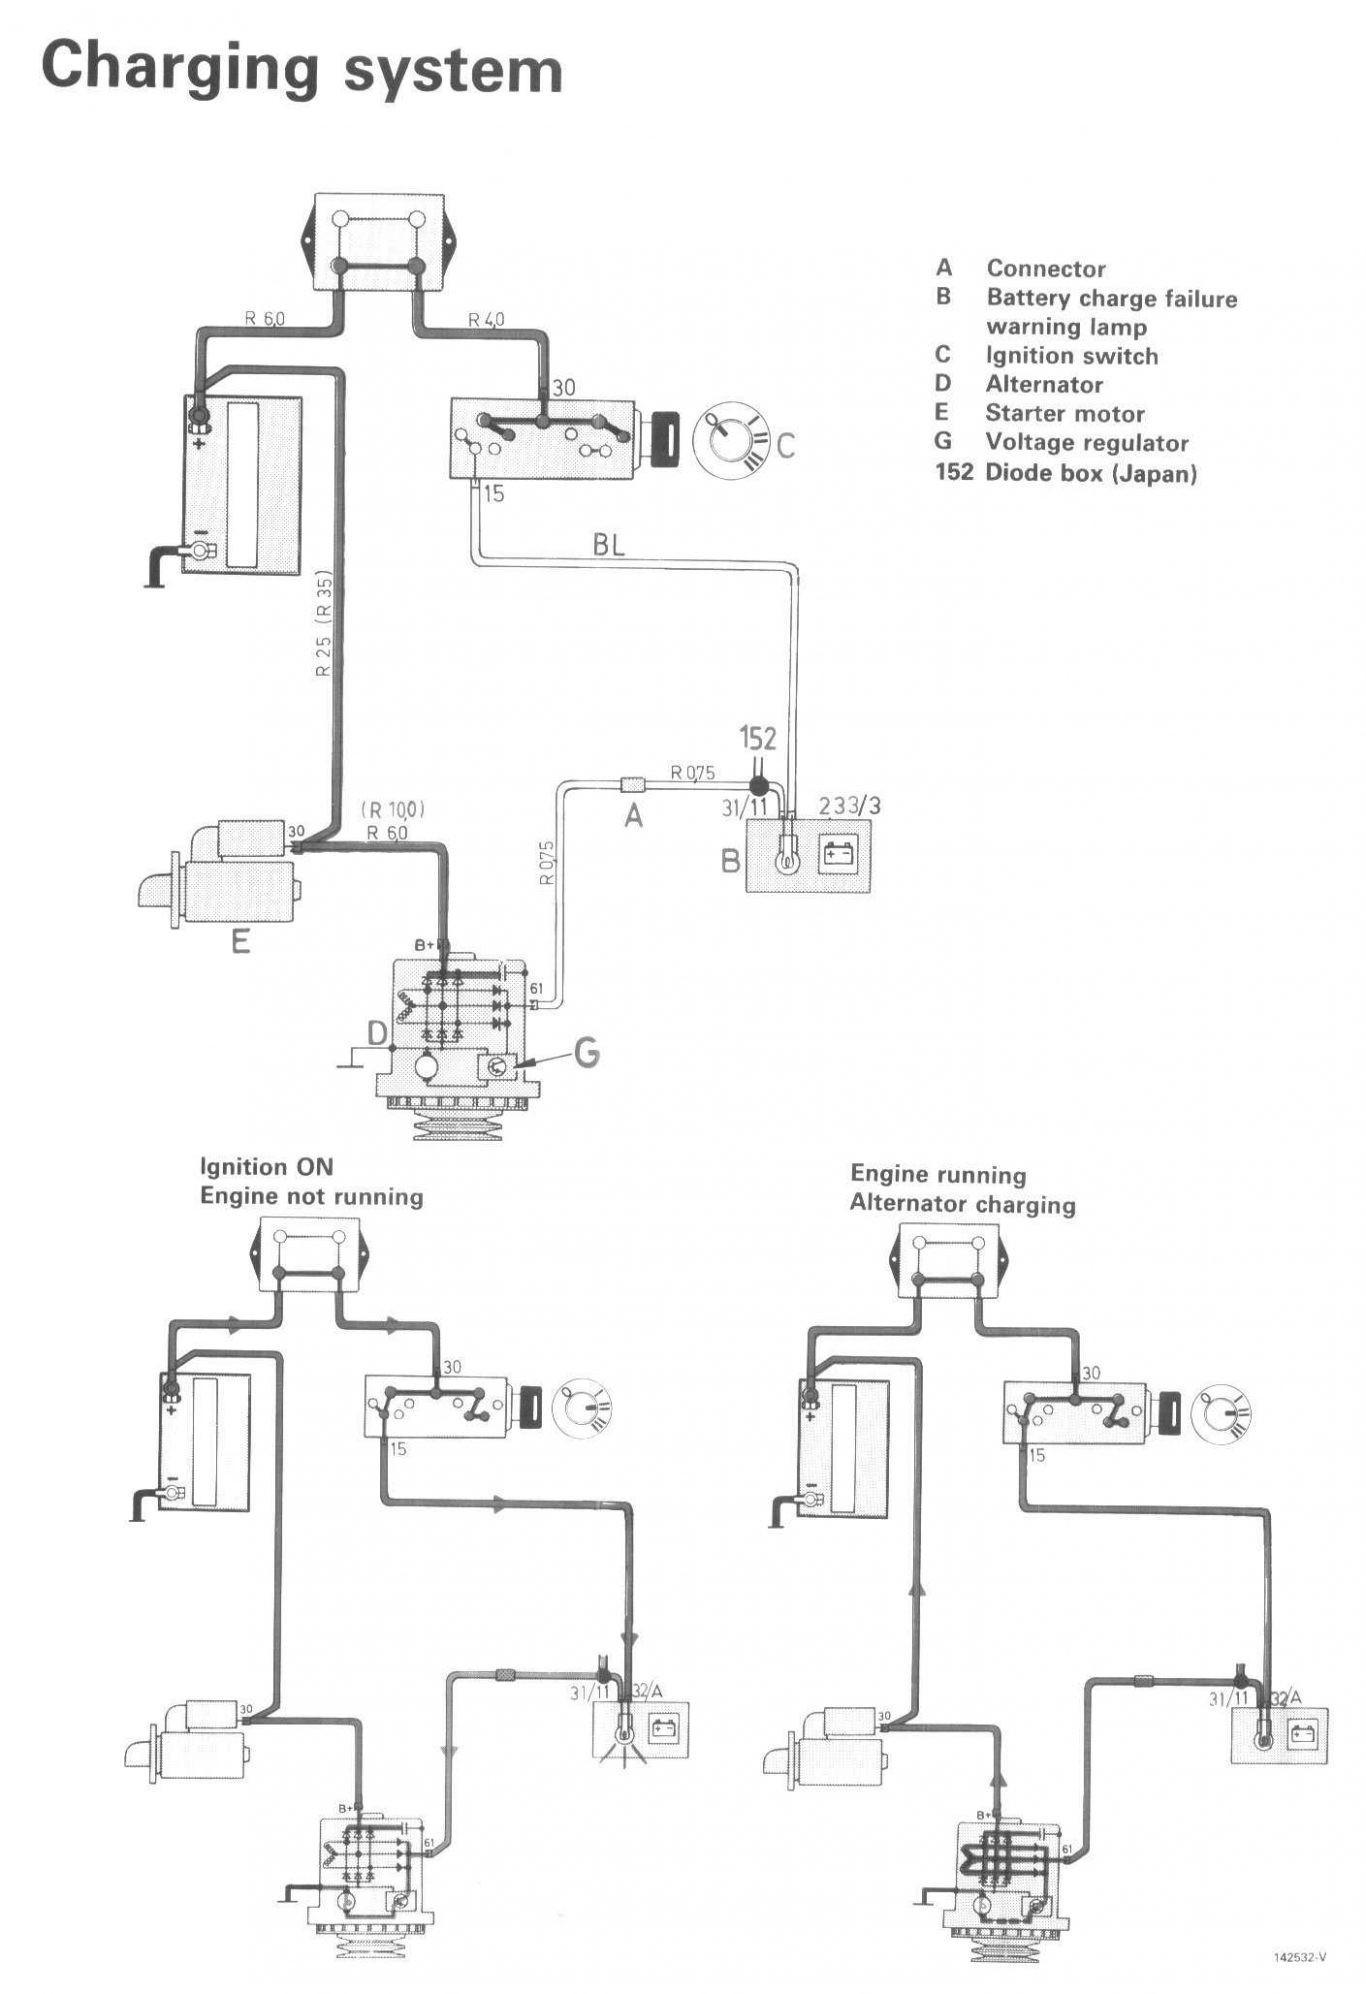 hight resolution of ford one wire alternator wiring diagram wiring diagram e wire alternator new chevy alternator wiring